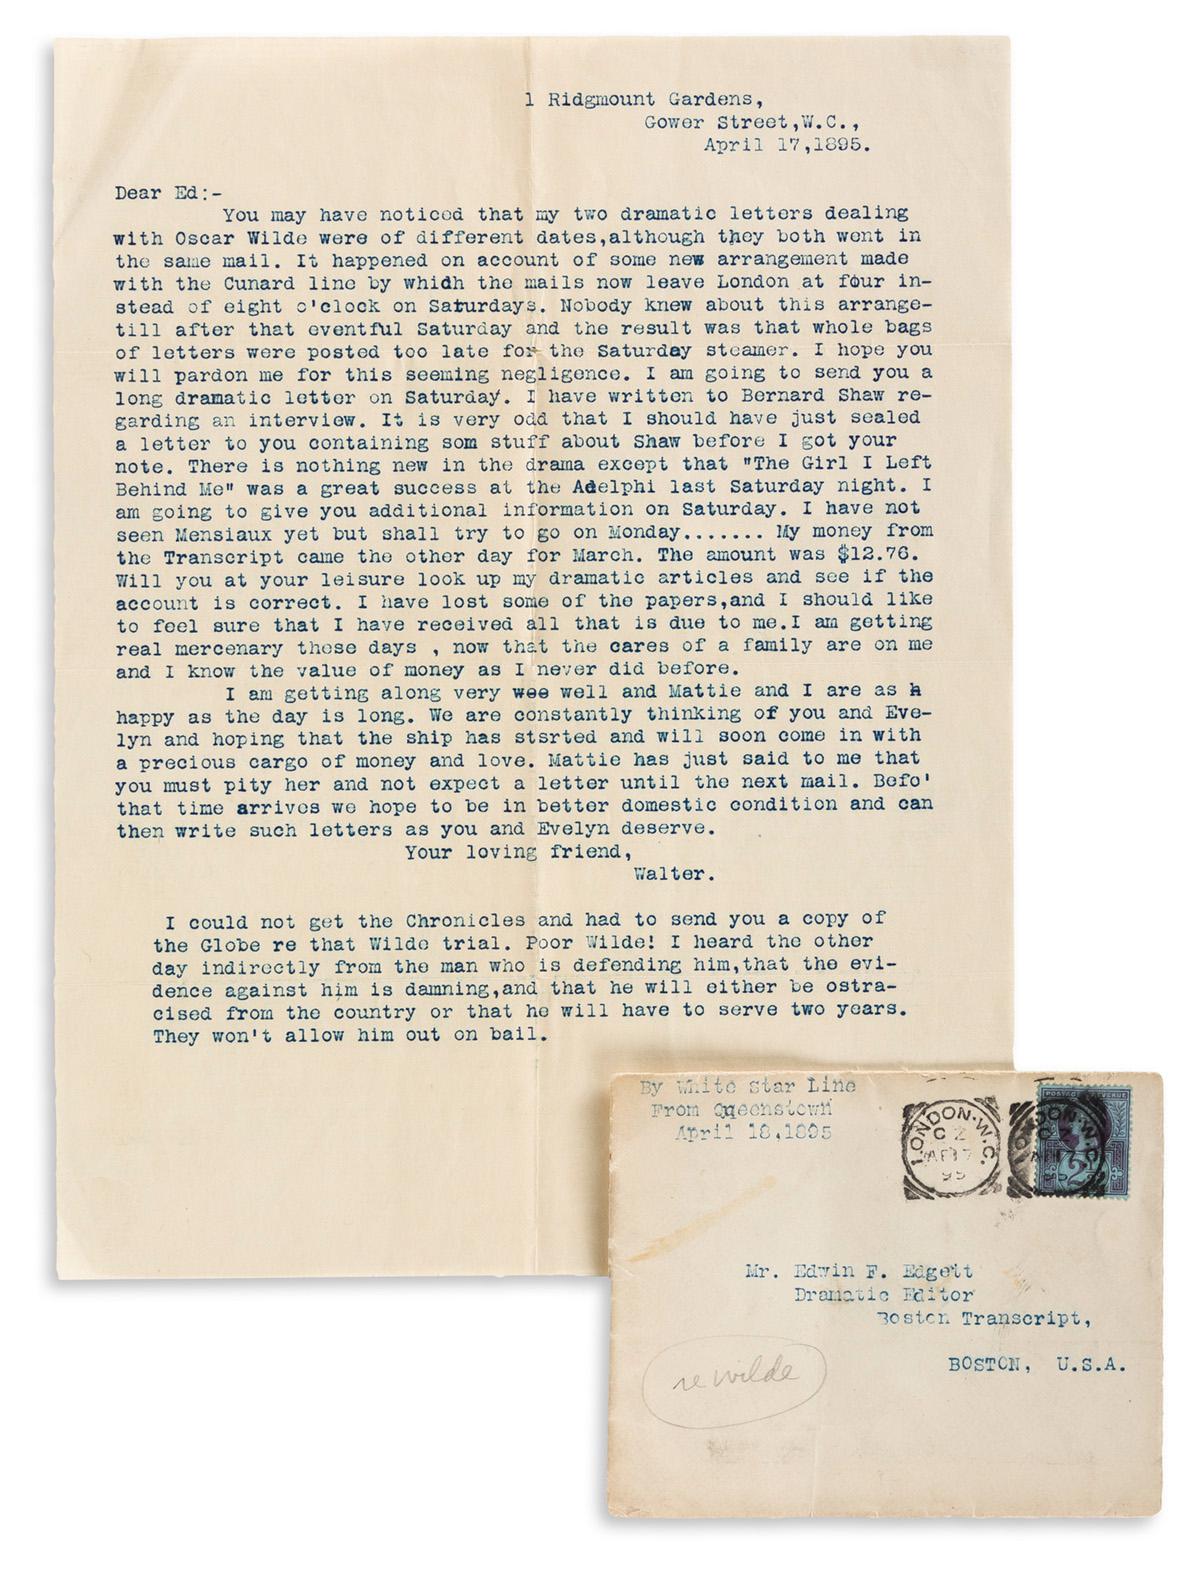 (OSCAR WILDE TRIAL.) Typed Letter Signed by unidentified drama critic to Boston Transcript editor Edwin F. Edgett regarding the trial o